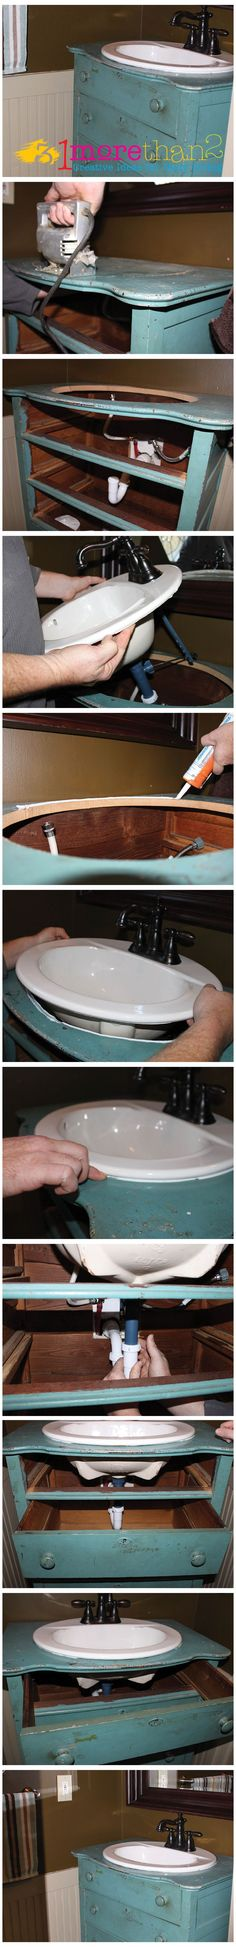 DIY Mueble para Baño  DIYrosa.com Facebook: fb.com/DIYrosa Twitter: @DIYrosa